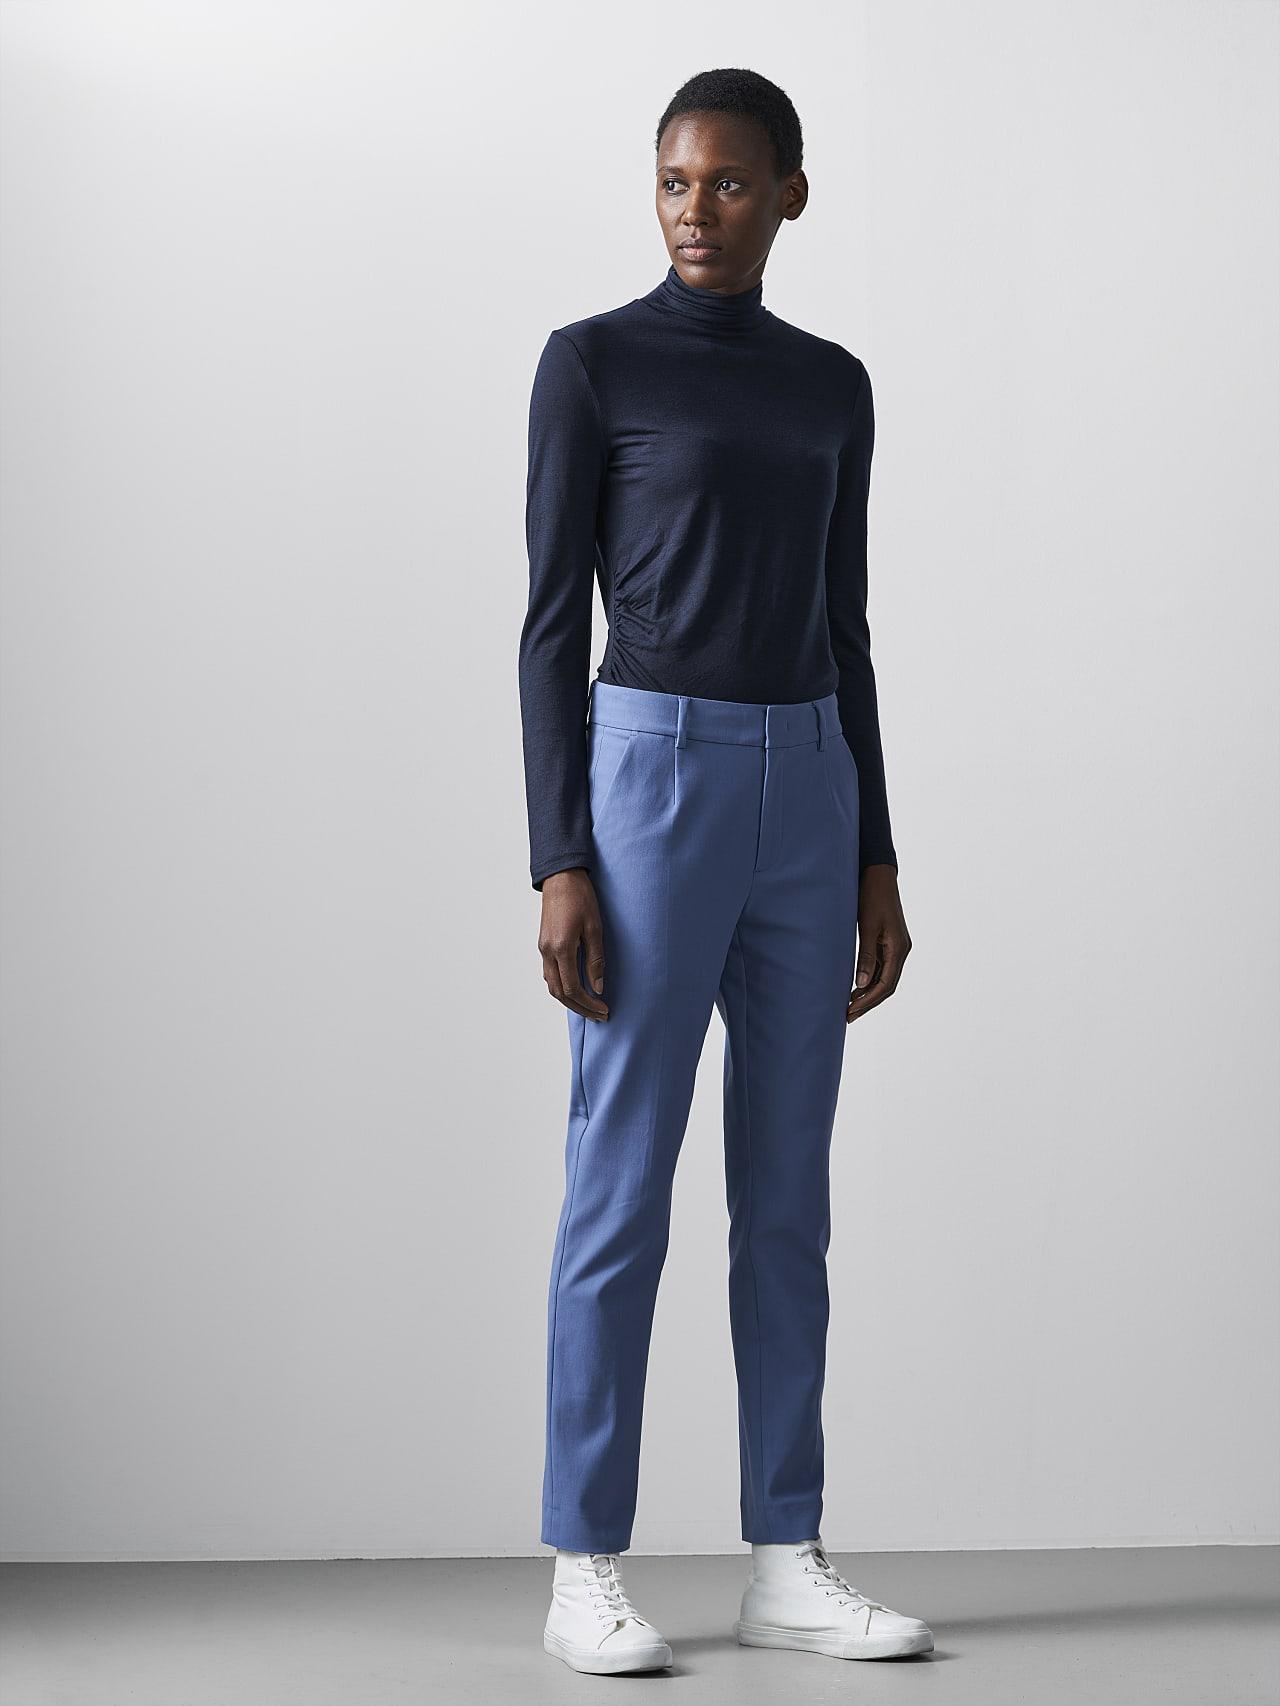 PERTI V1.Y5.02 Slim-Fit Tapered Pants light blue Front Alpha Tauri